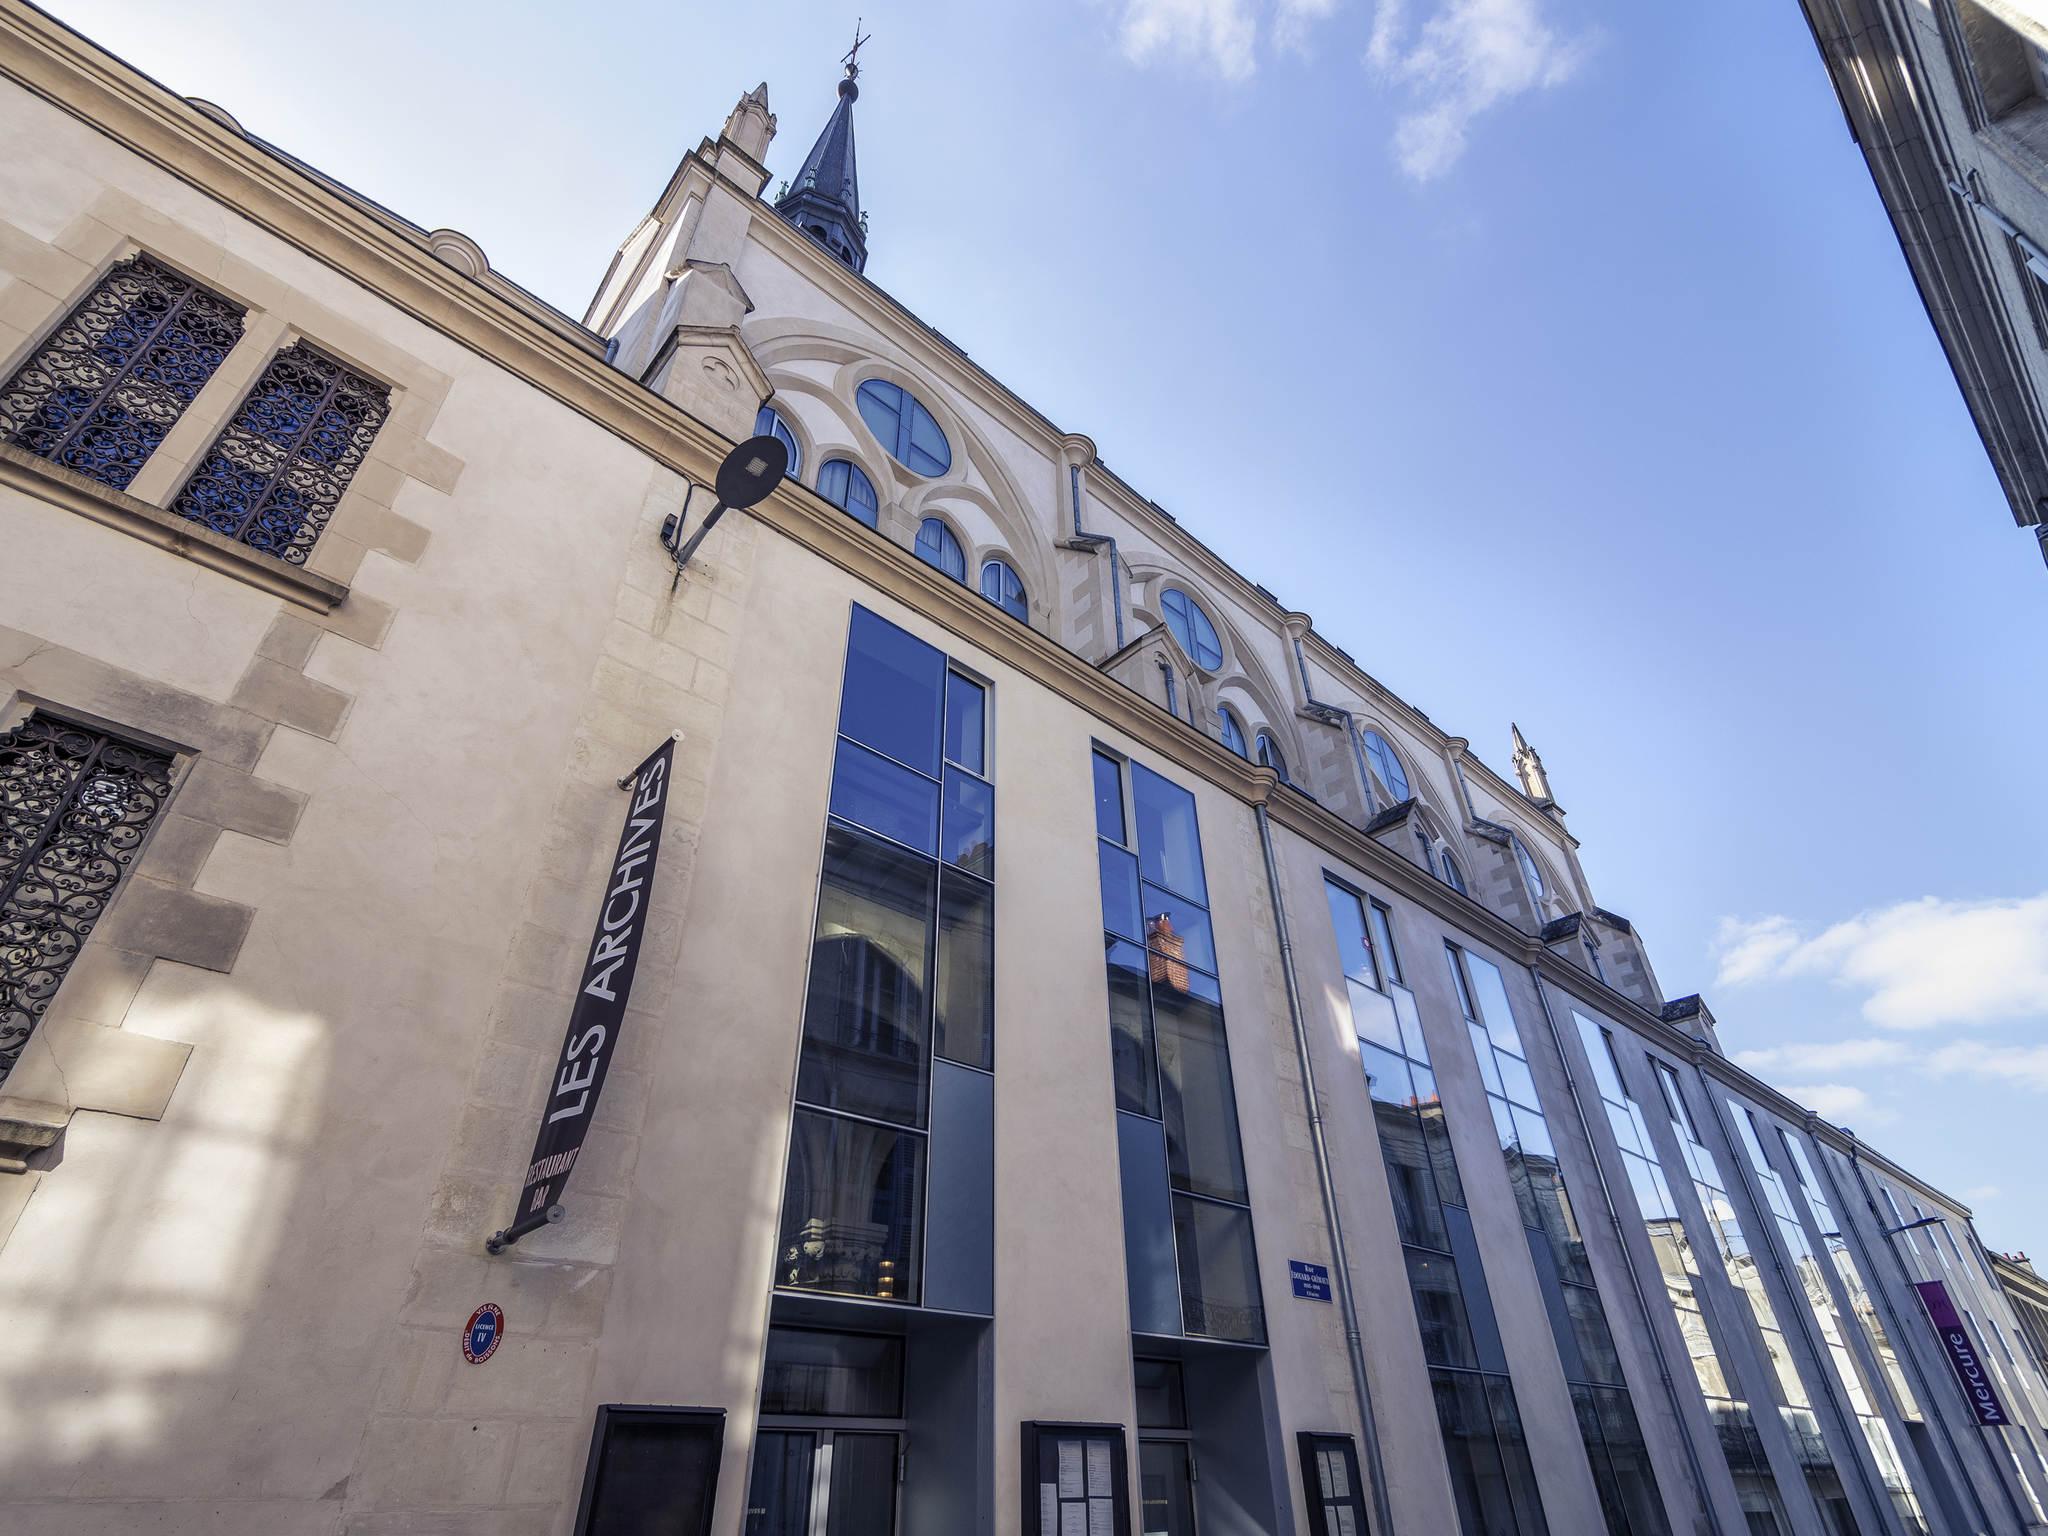 Hotel – Hotel Mercure Poitiers Centre